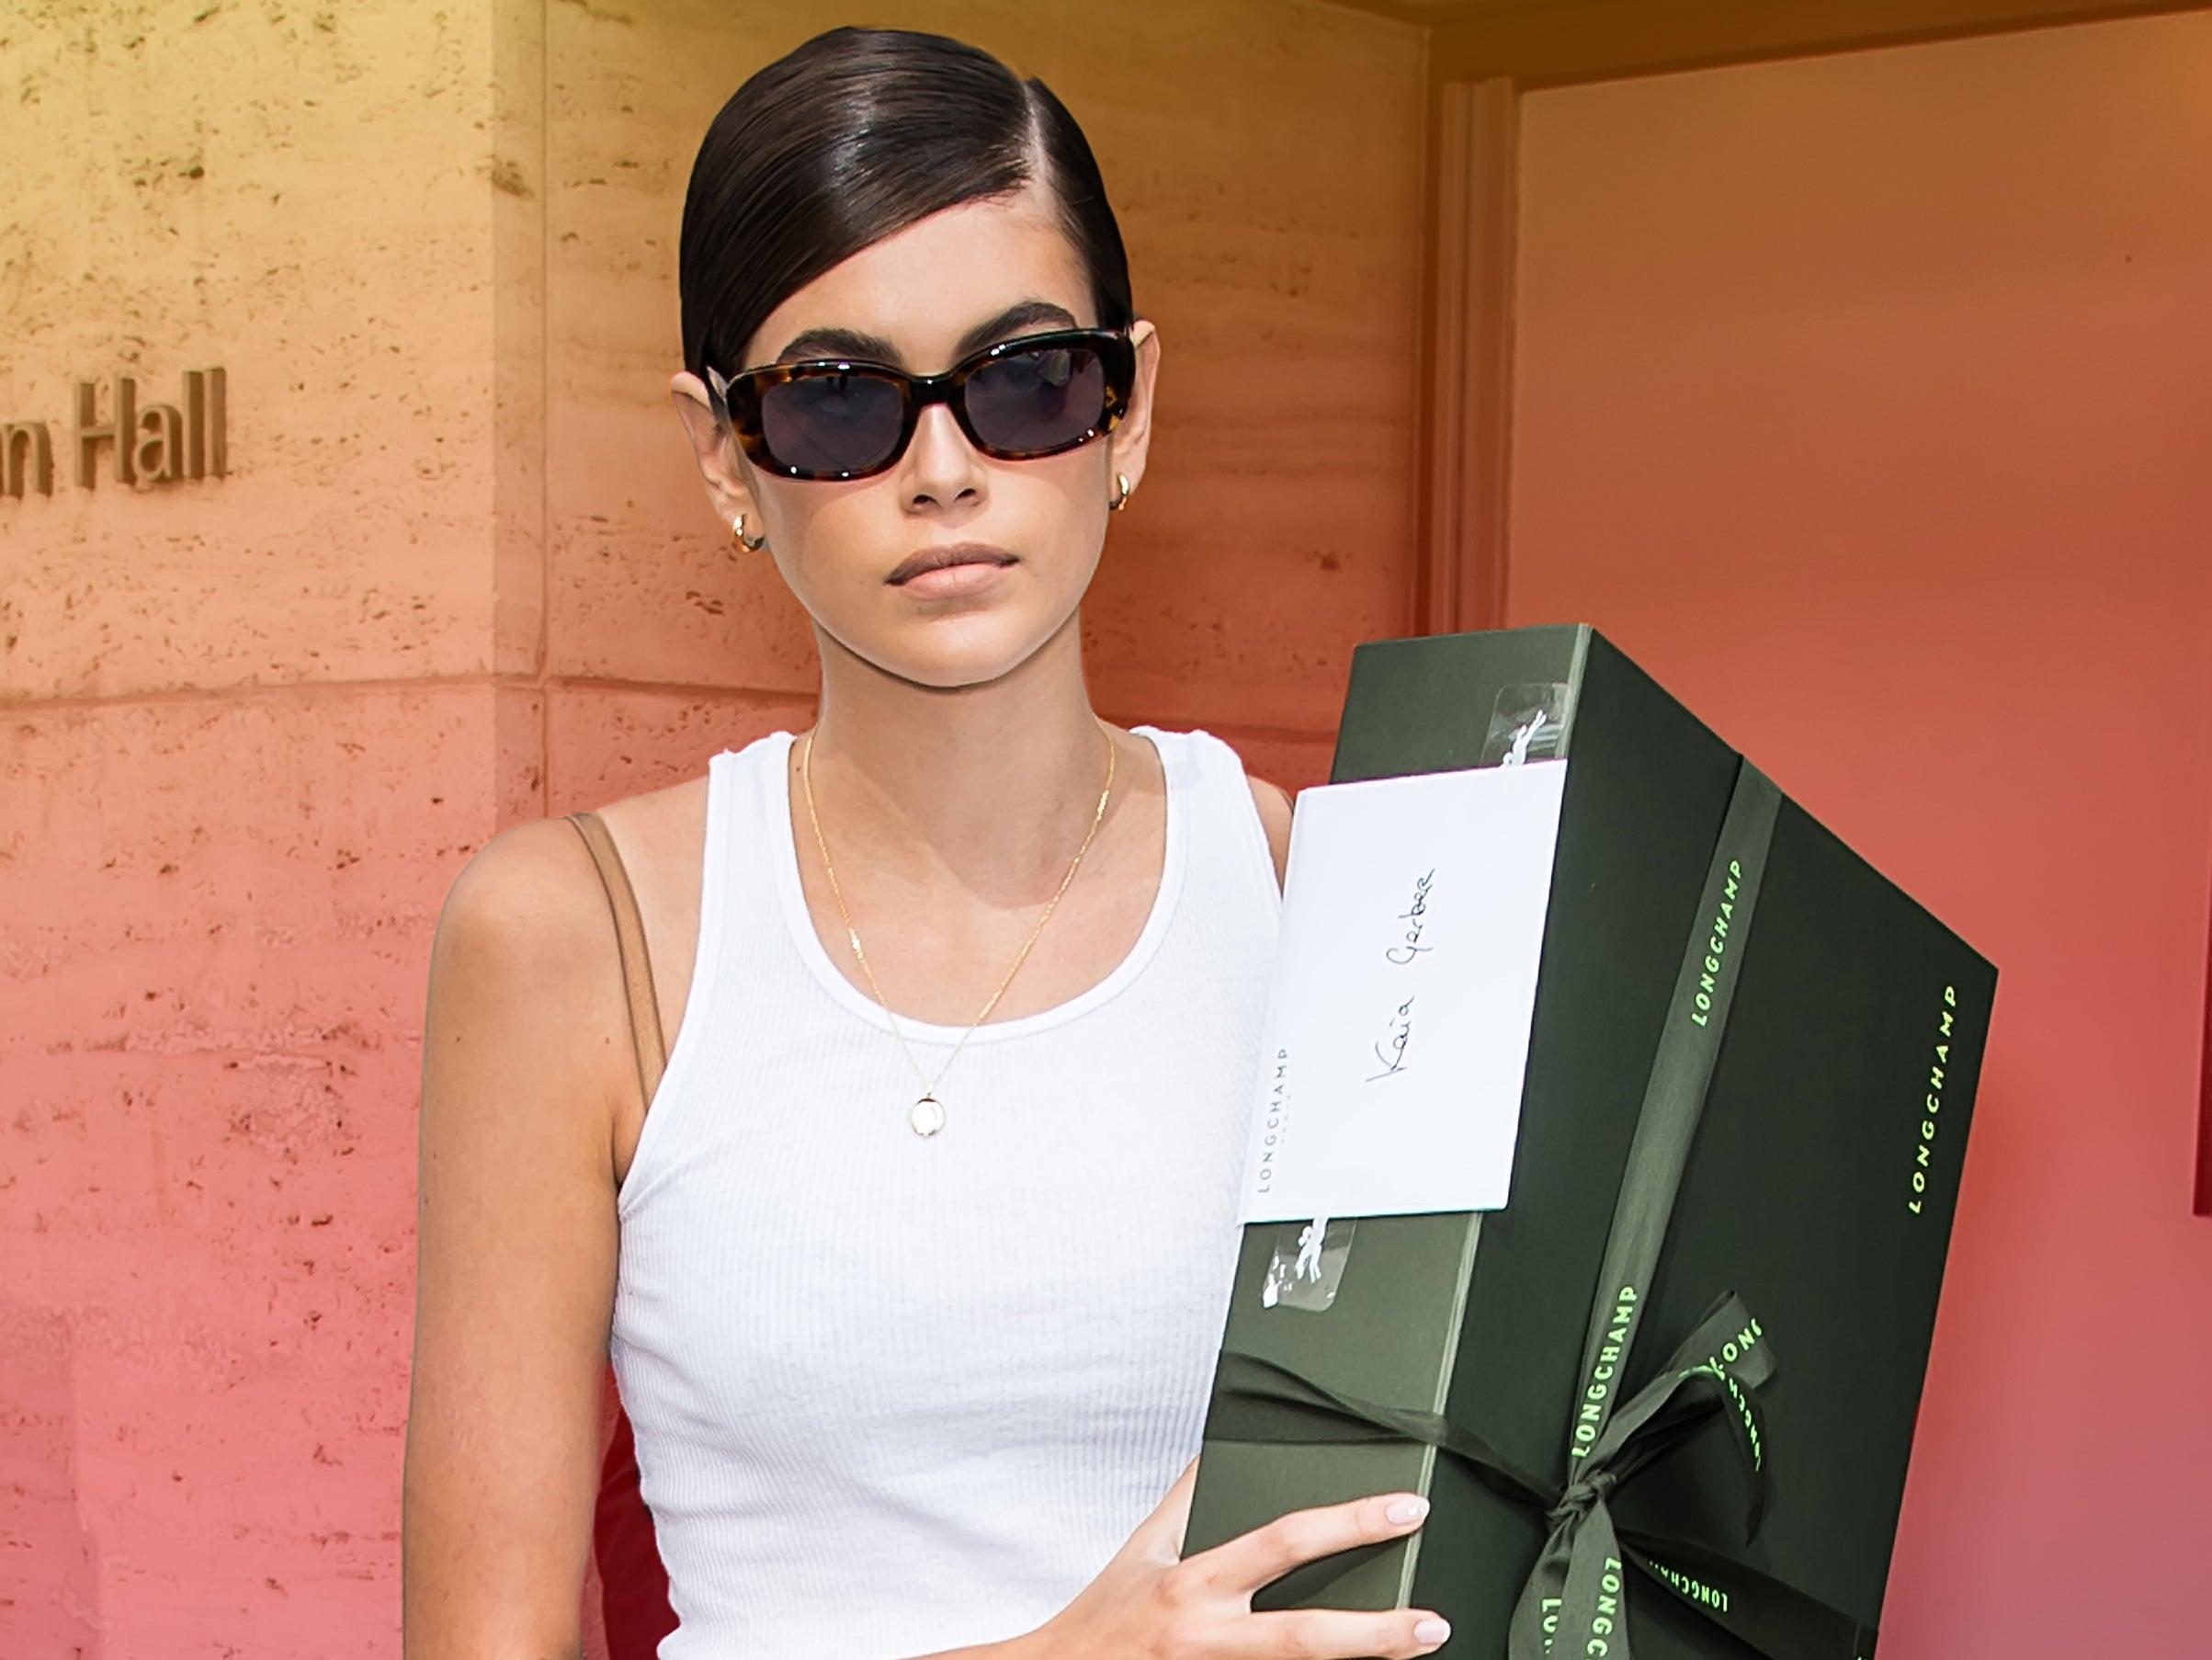 Rihanna Fenty Fashion Ad Features Model JoAni Johnson